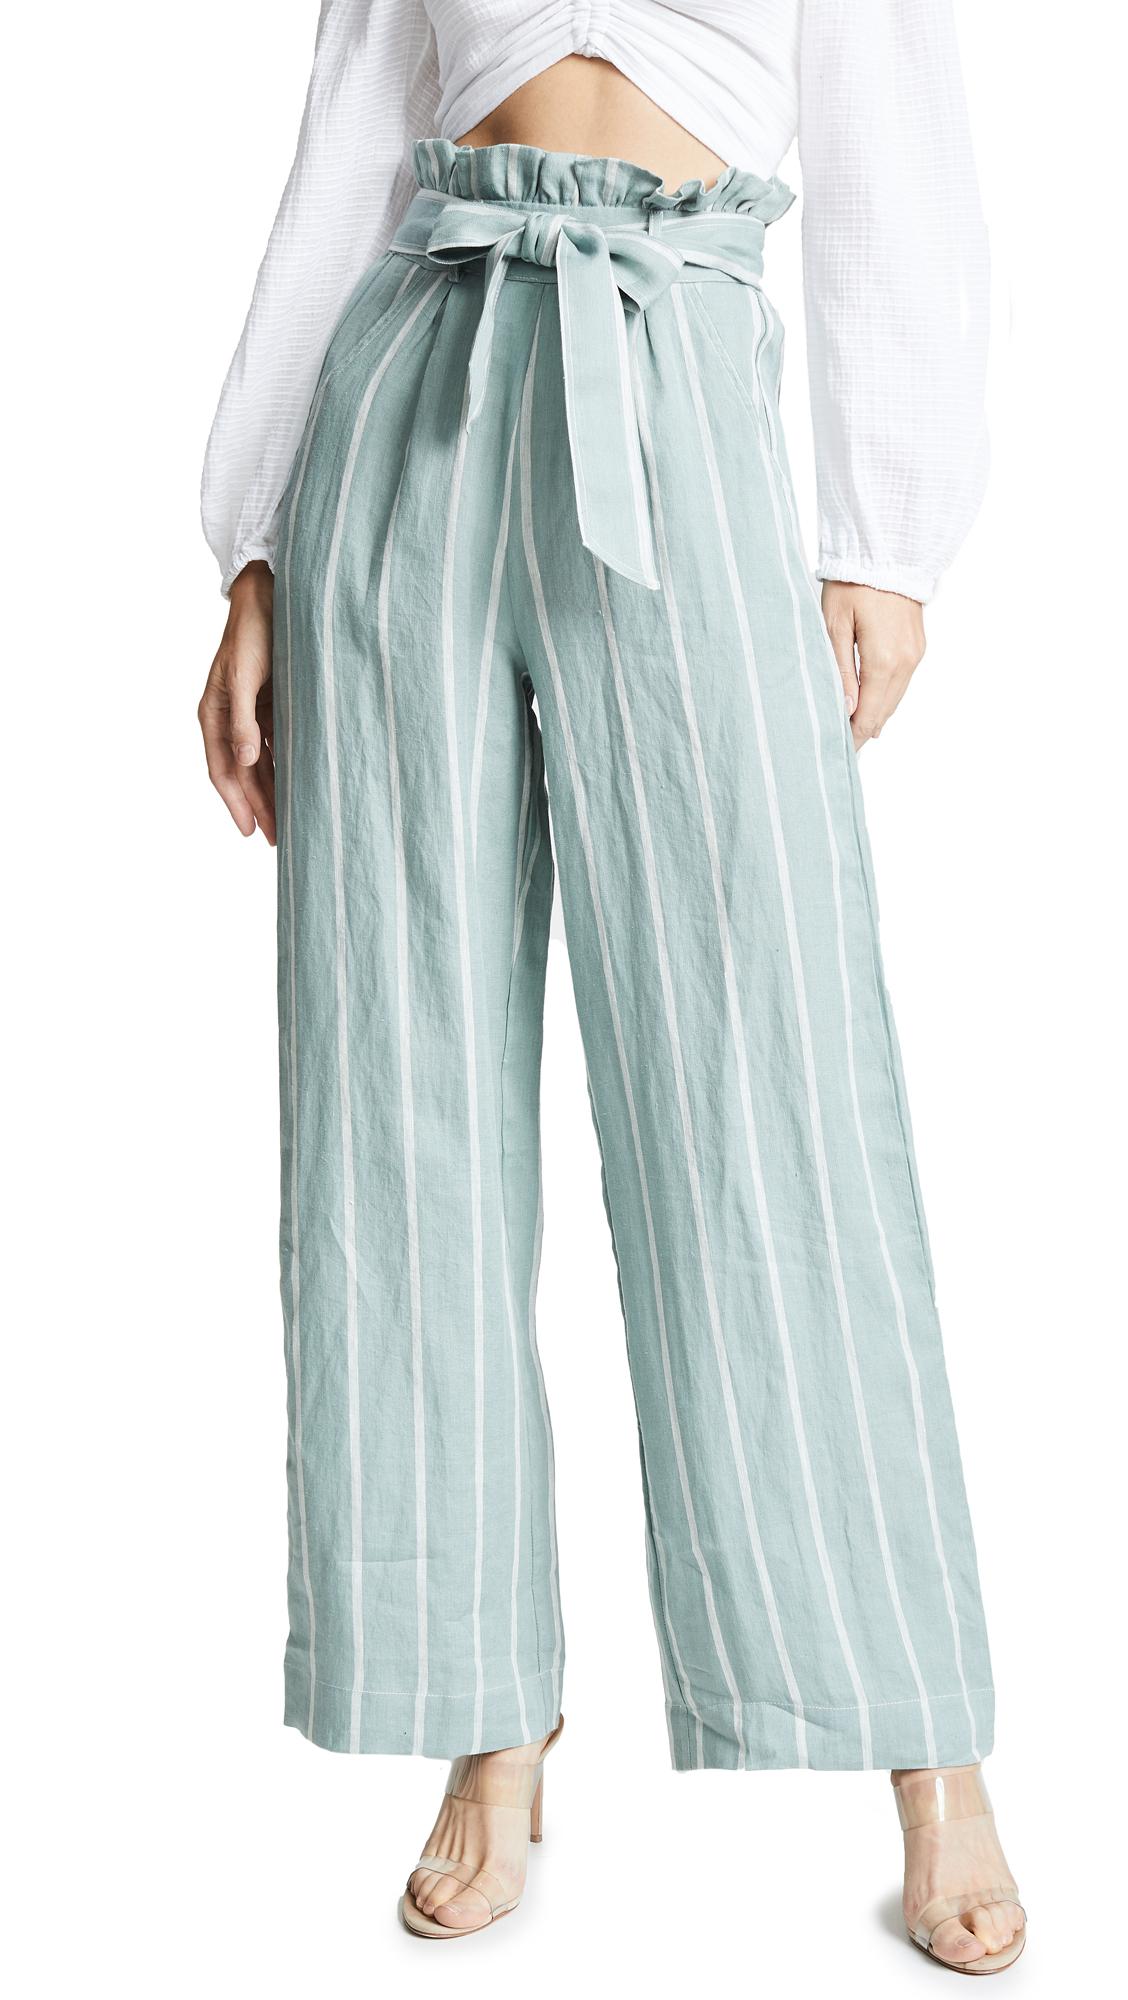 Suboo Horizon Wide Leg Pants In Green/White Stripe